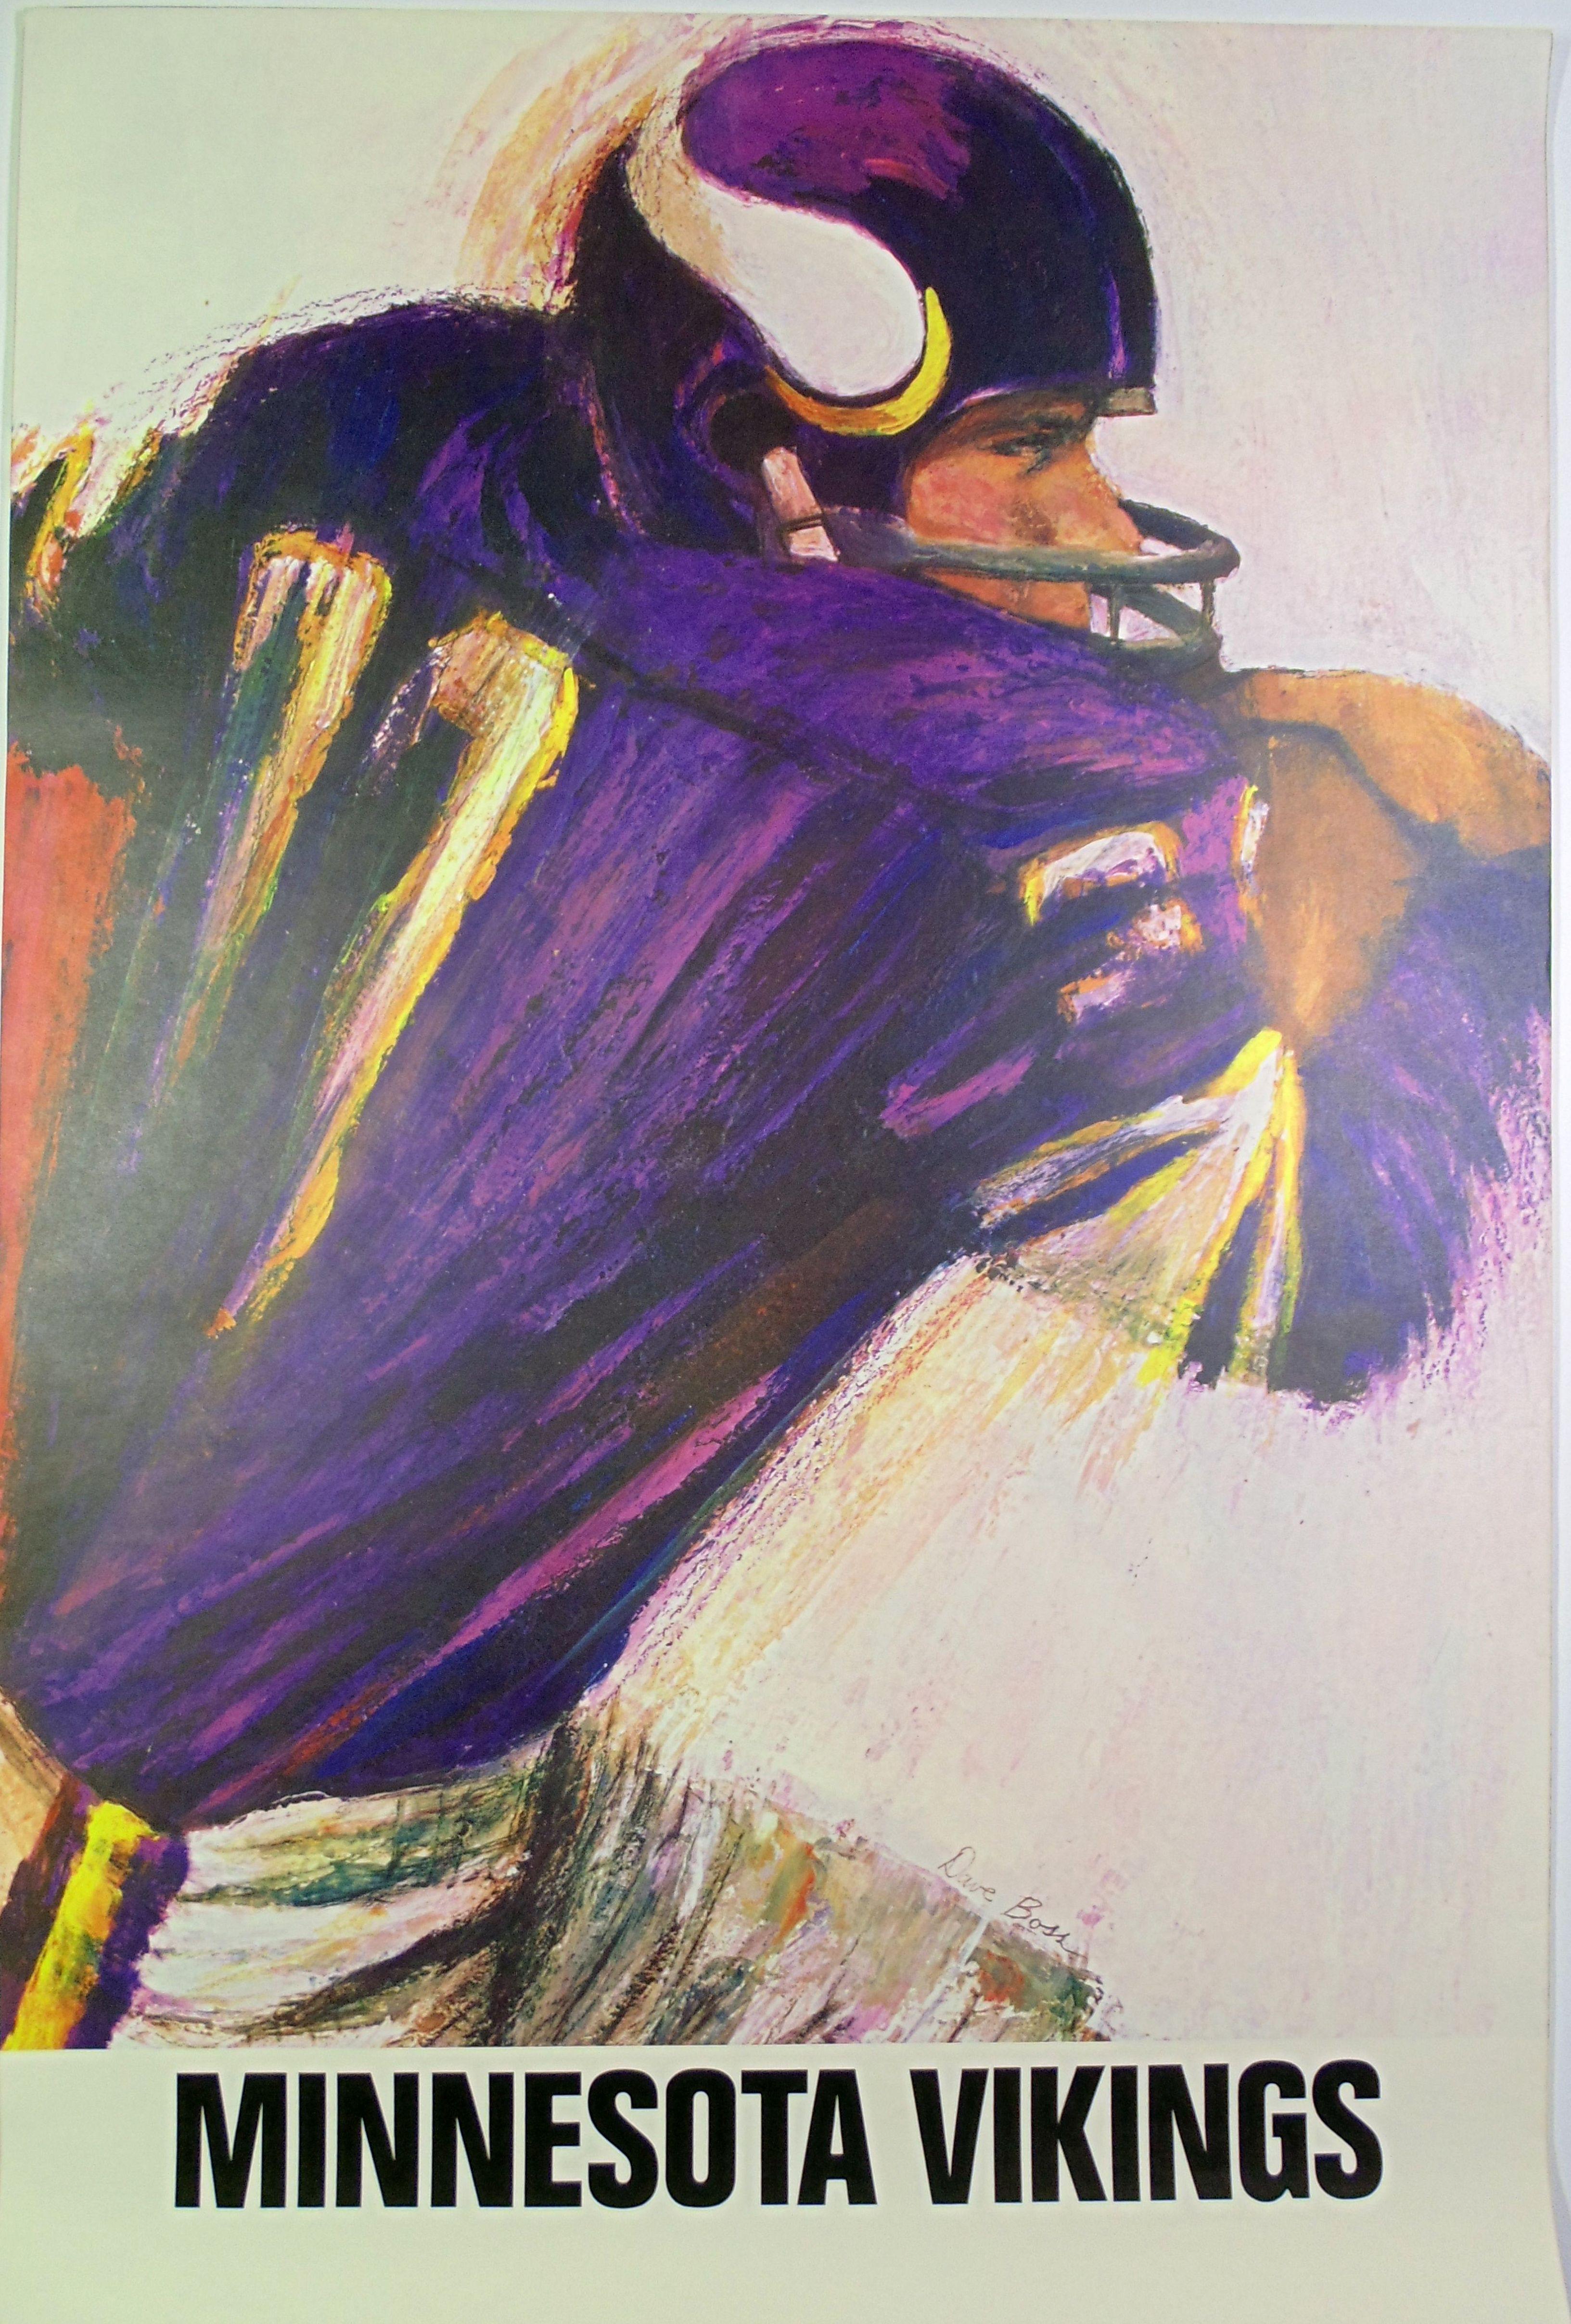 ac0dbc913 Vintage original NFL Minnesota Vikings 1966 art poster by Dave Boss ...